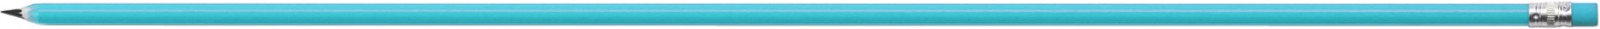 Pencil with eraser - Light Blue